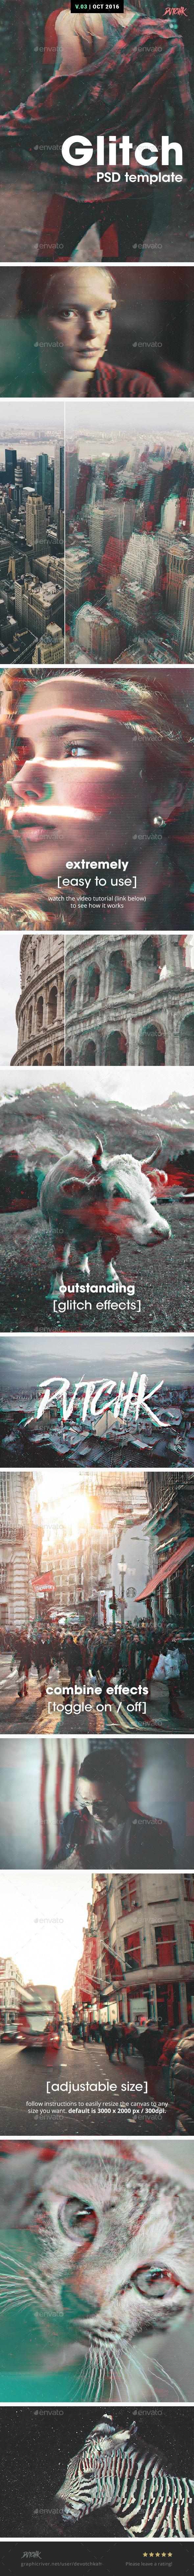 Glitch Photoshop Photo Template - Tech / Futuristic Photo Templates